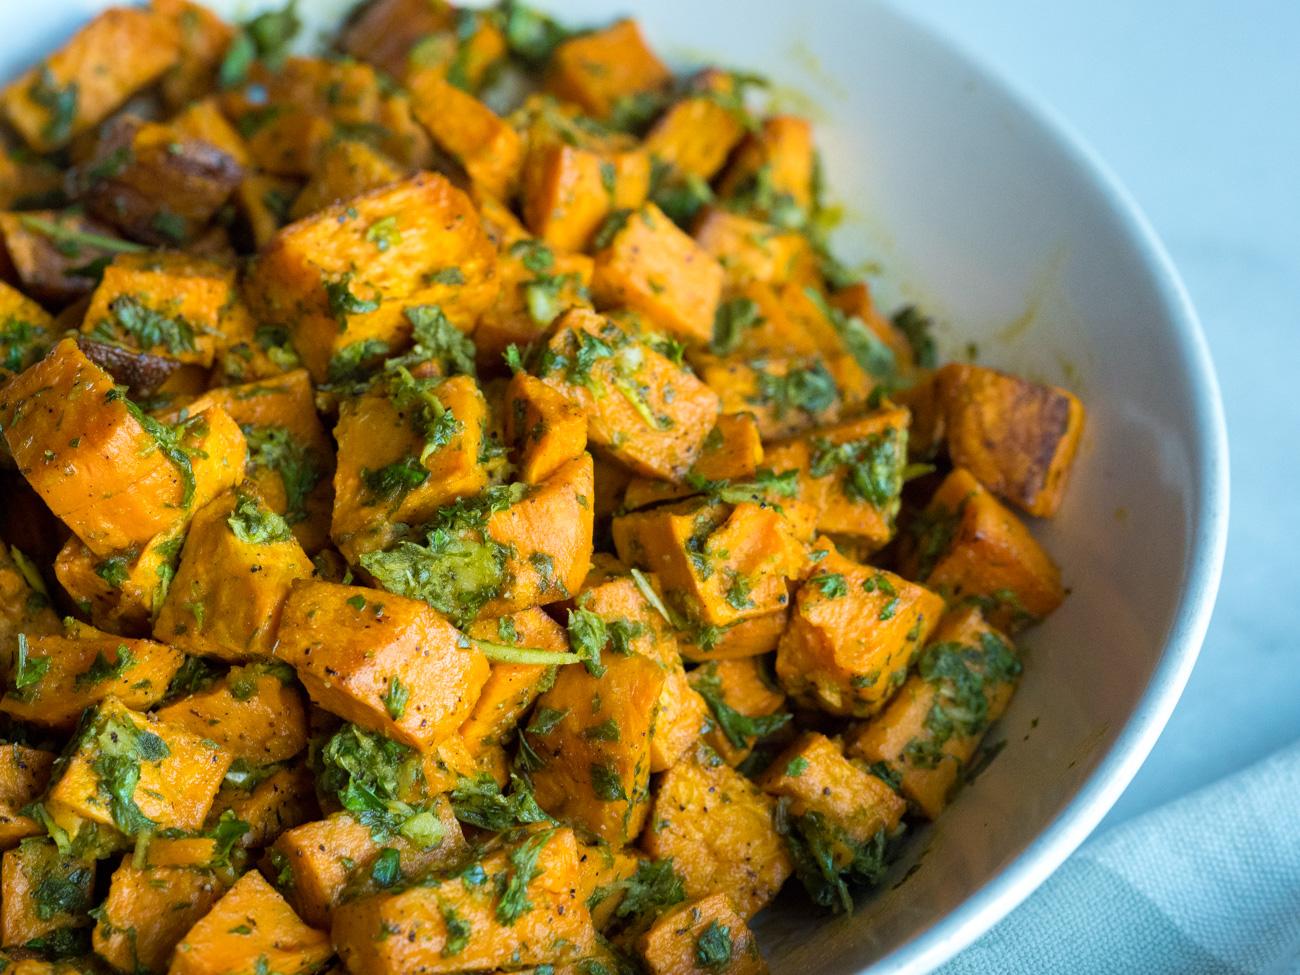 Dish of roasted sweet potatoes